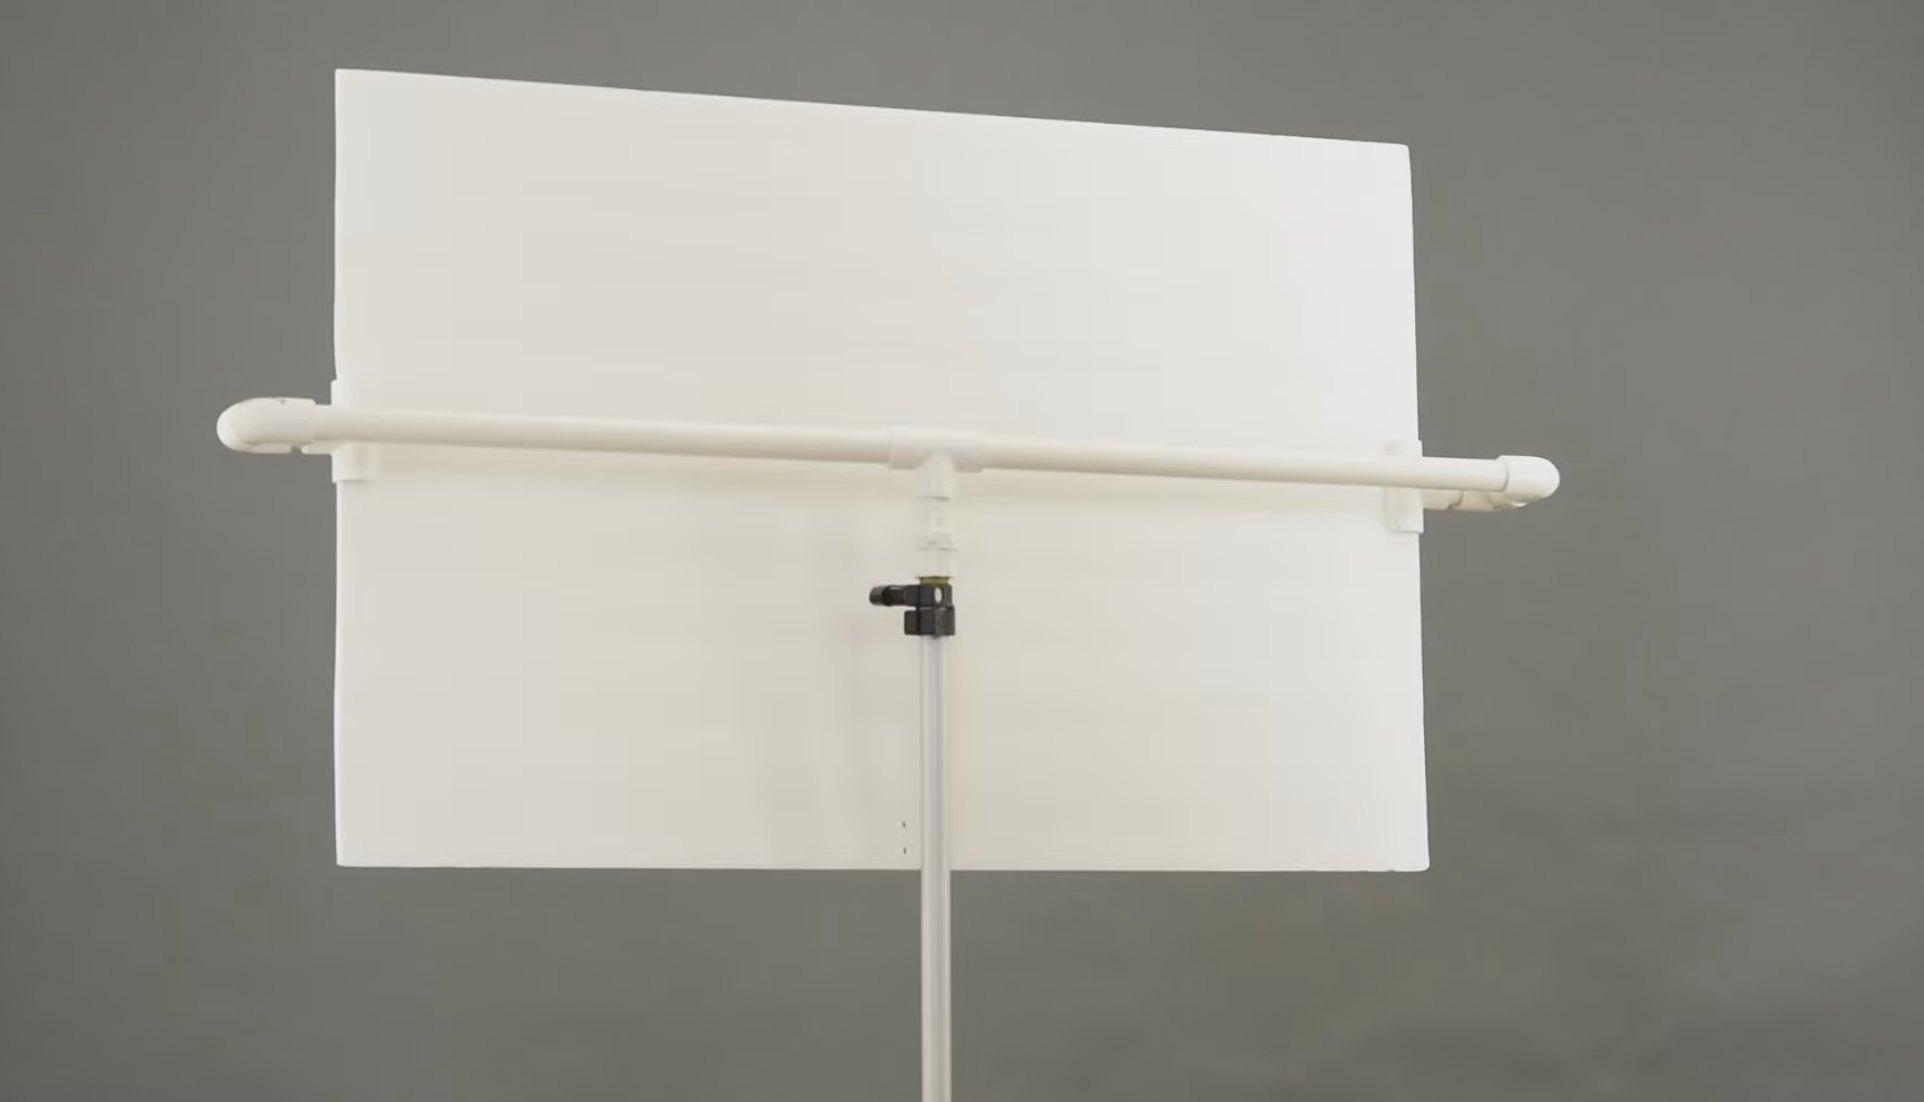 pvc-reflector-holder-02